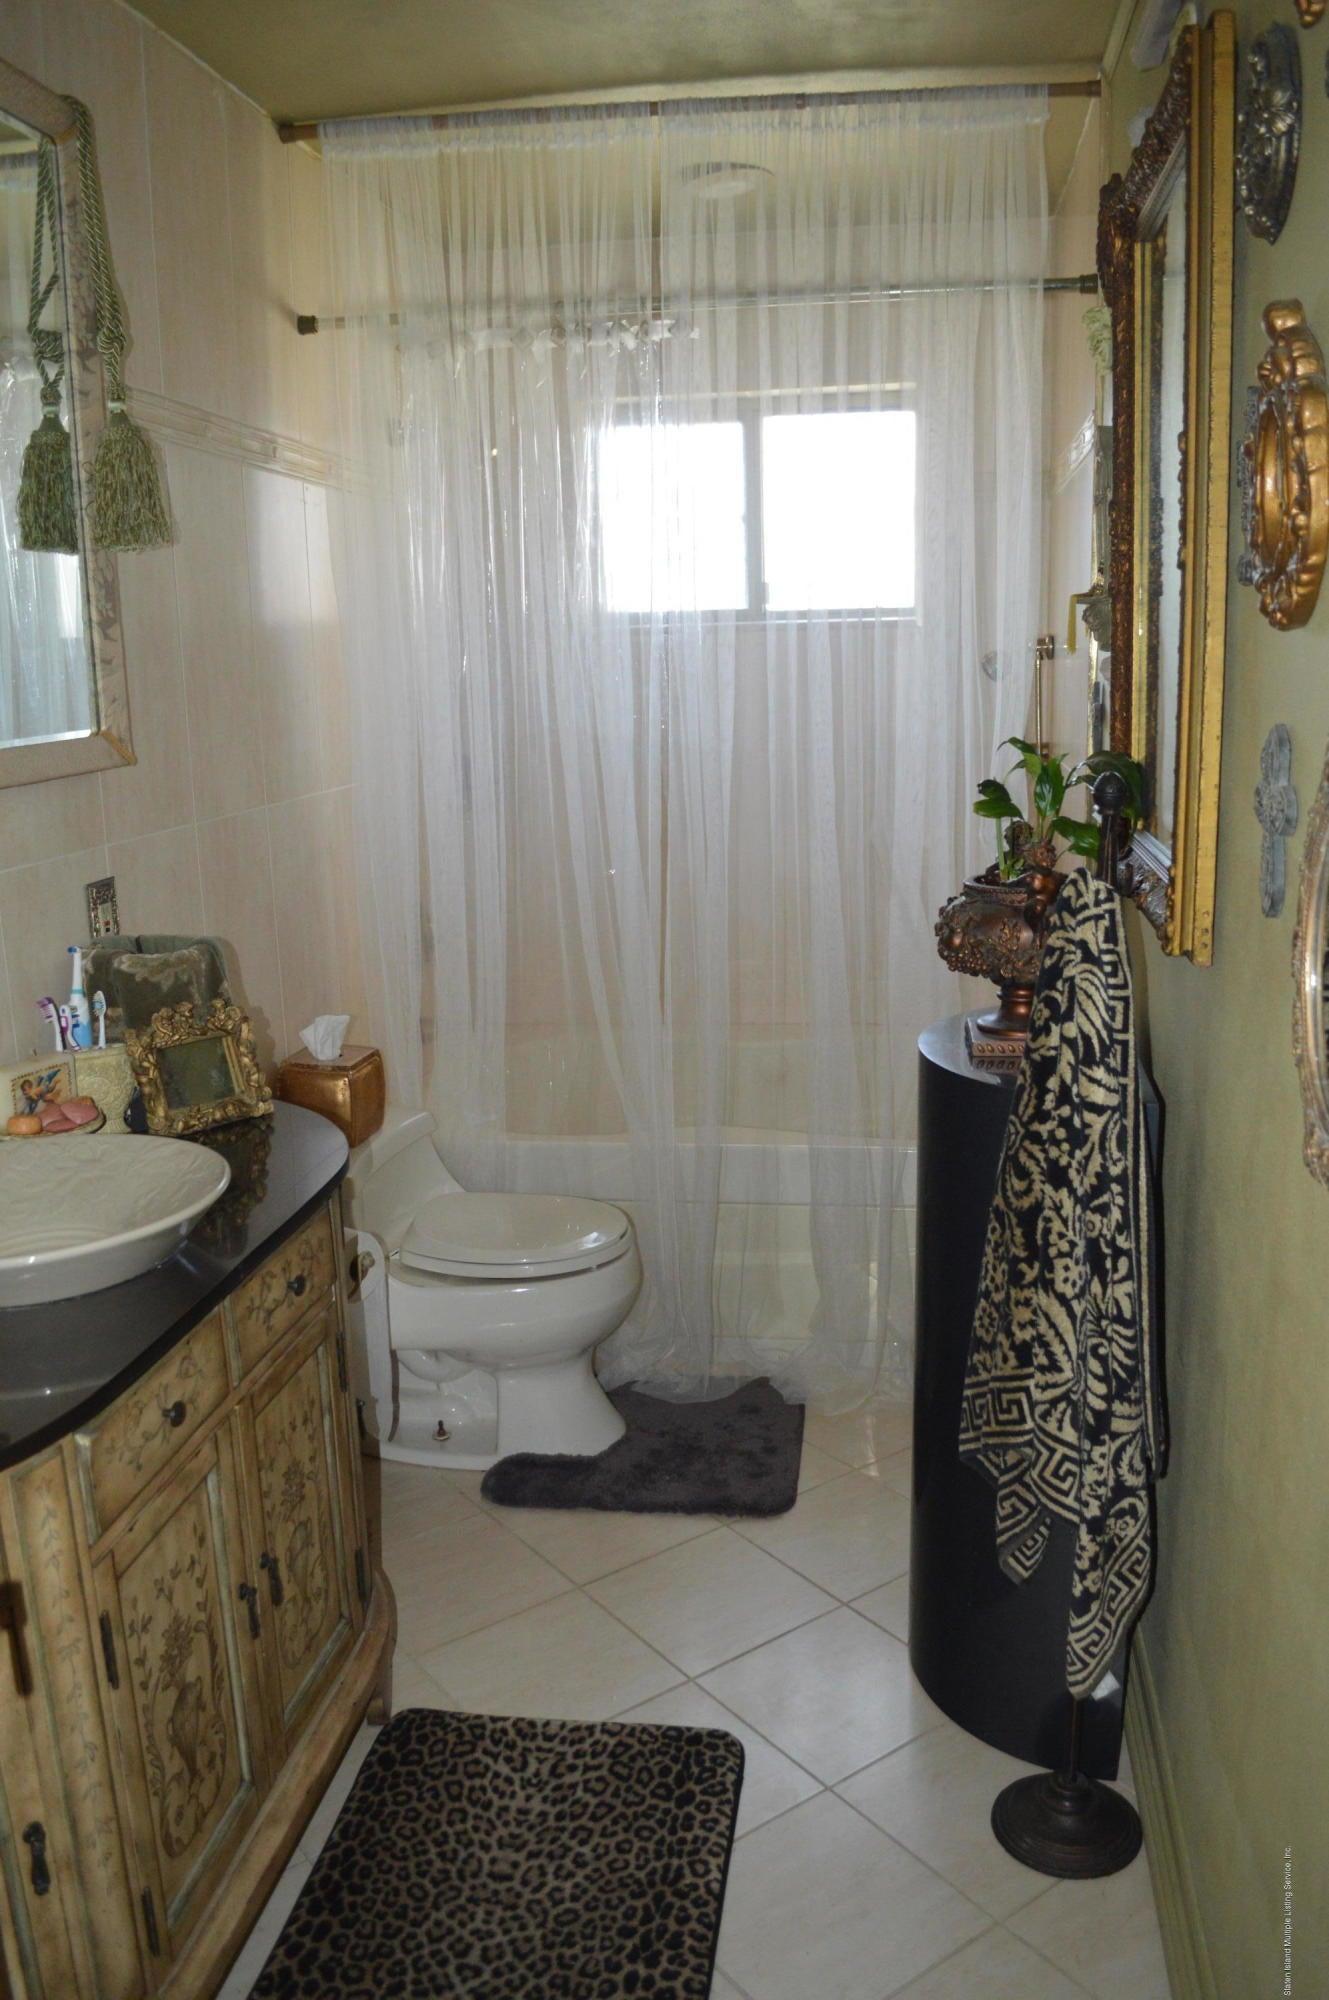 Single Family - Detached 525 Sycamore Street  Staten Island, NY 10312, MLS-1118843-26